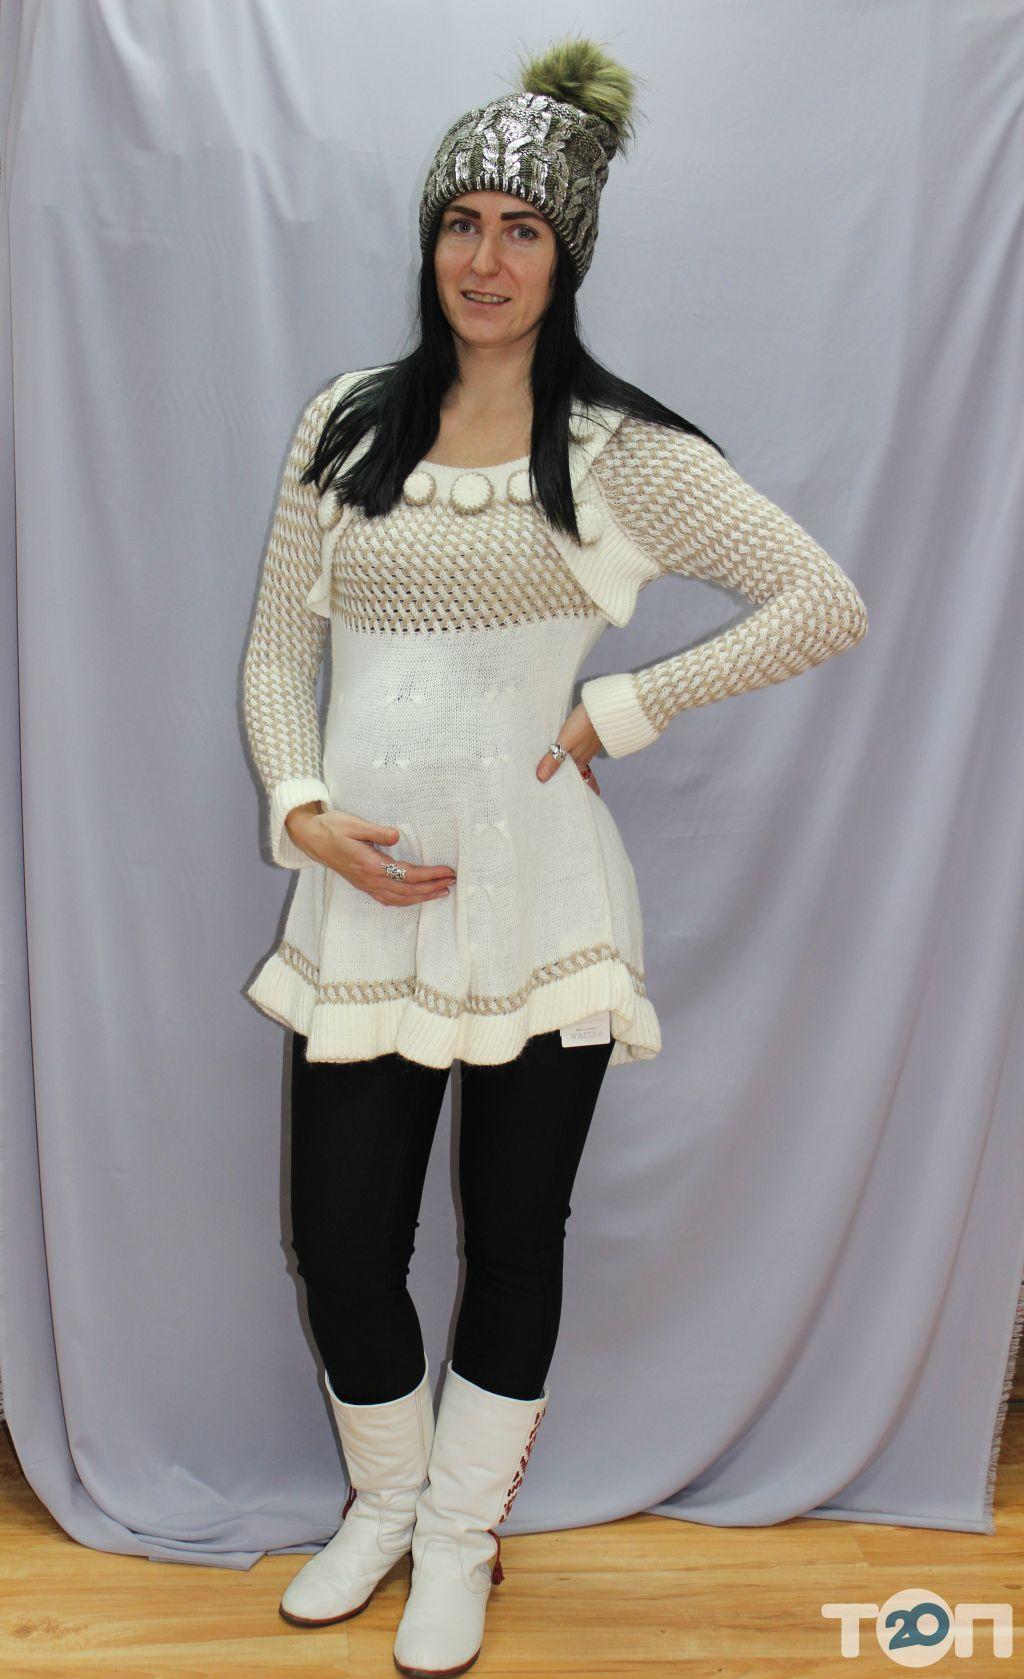 Дануся, одежда для беременных - фото 42